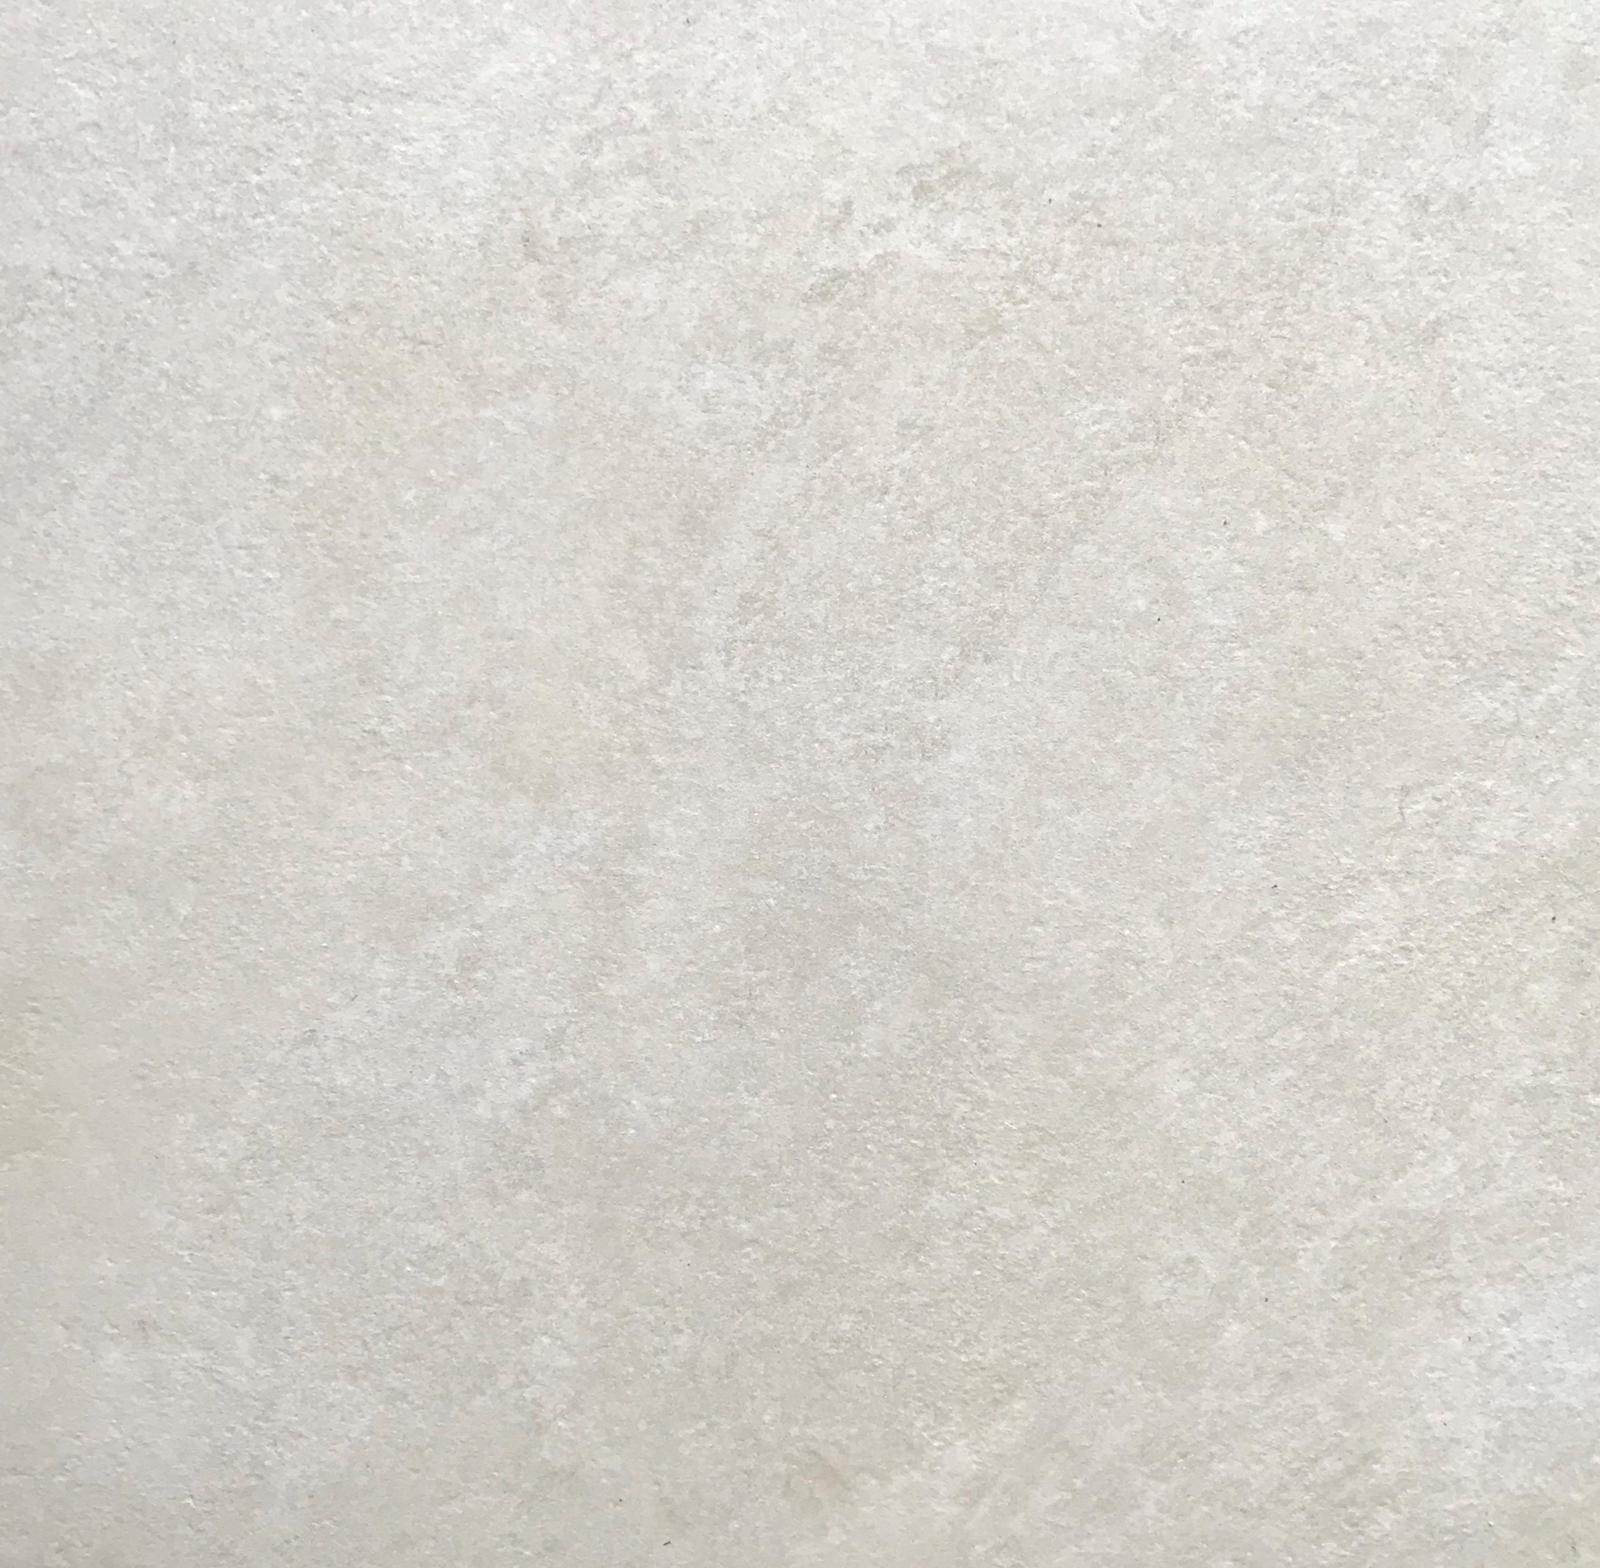 White Dew Porcelain 600 x 600 x 20mm (21.60m2 Per Pack)